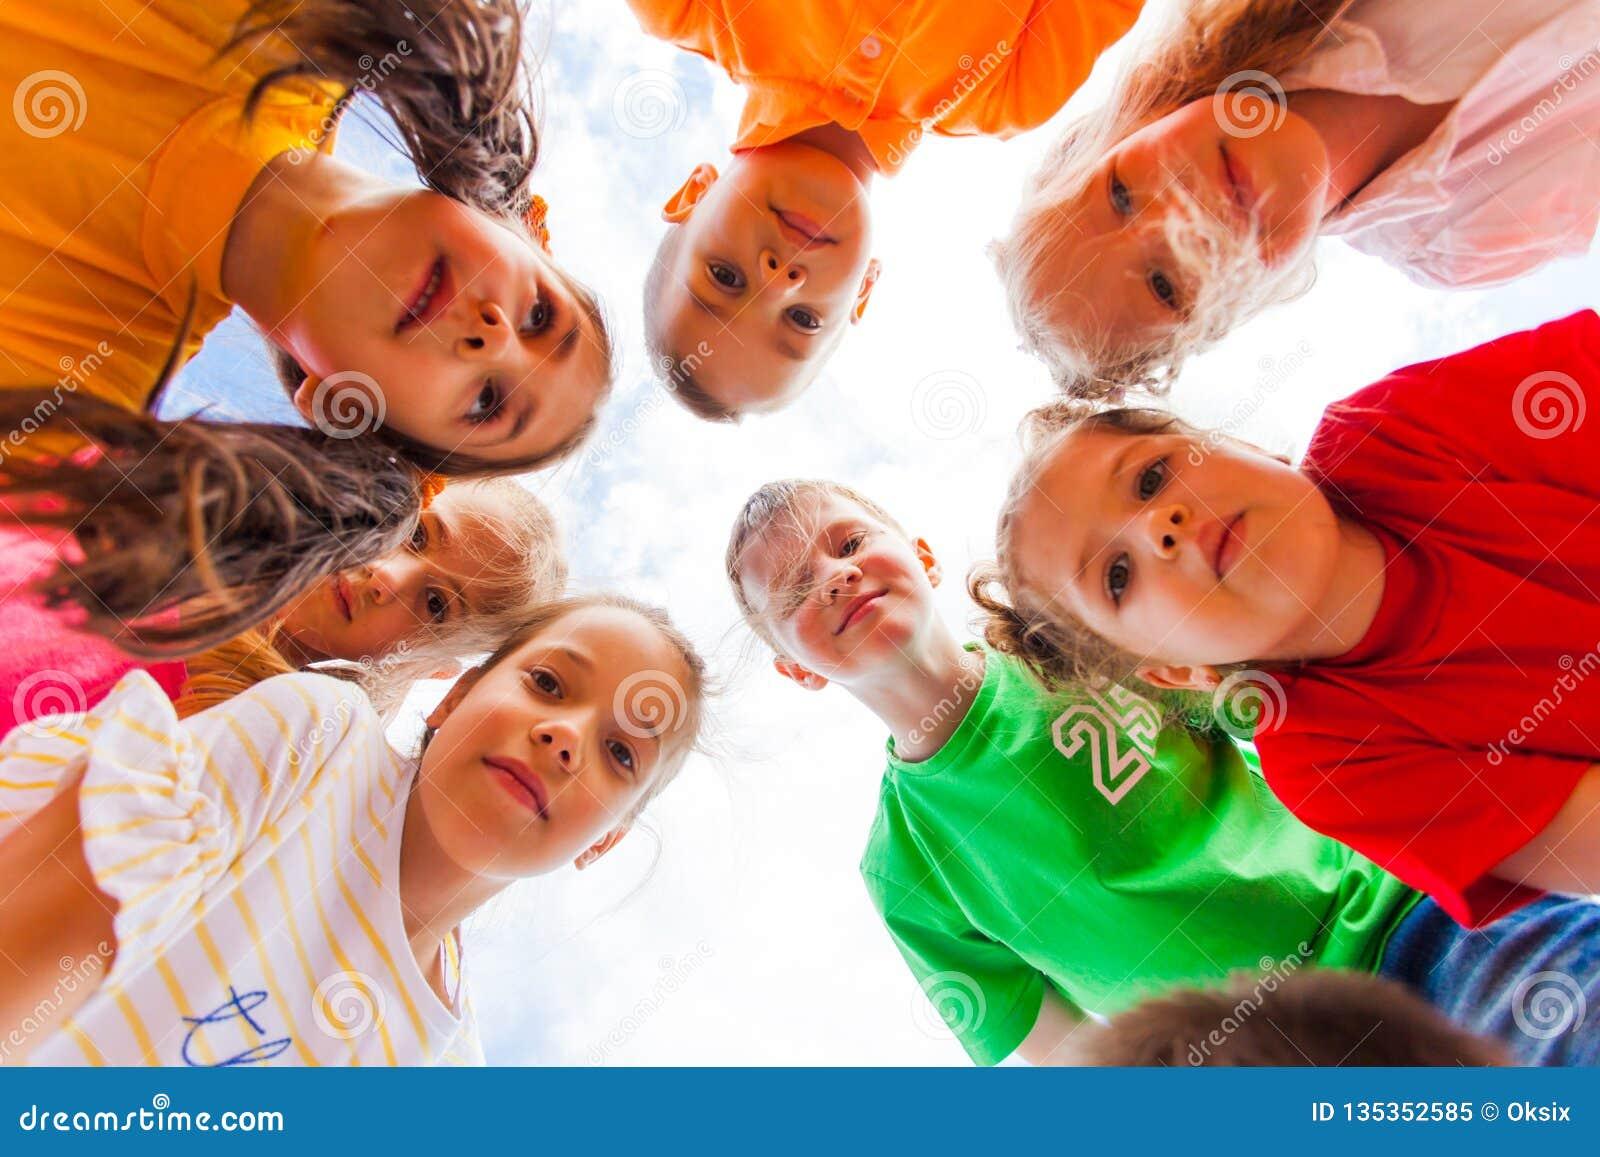 Enfants se tenant ensemble en cercle regardant la caméra